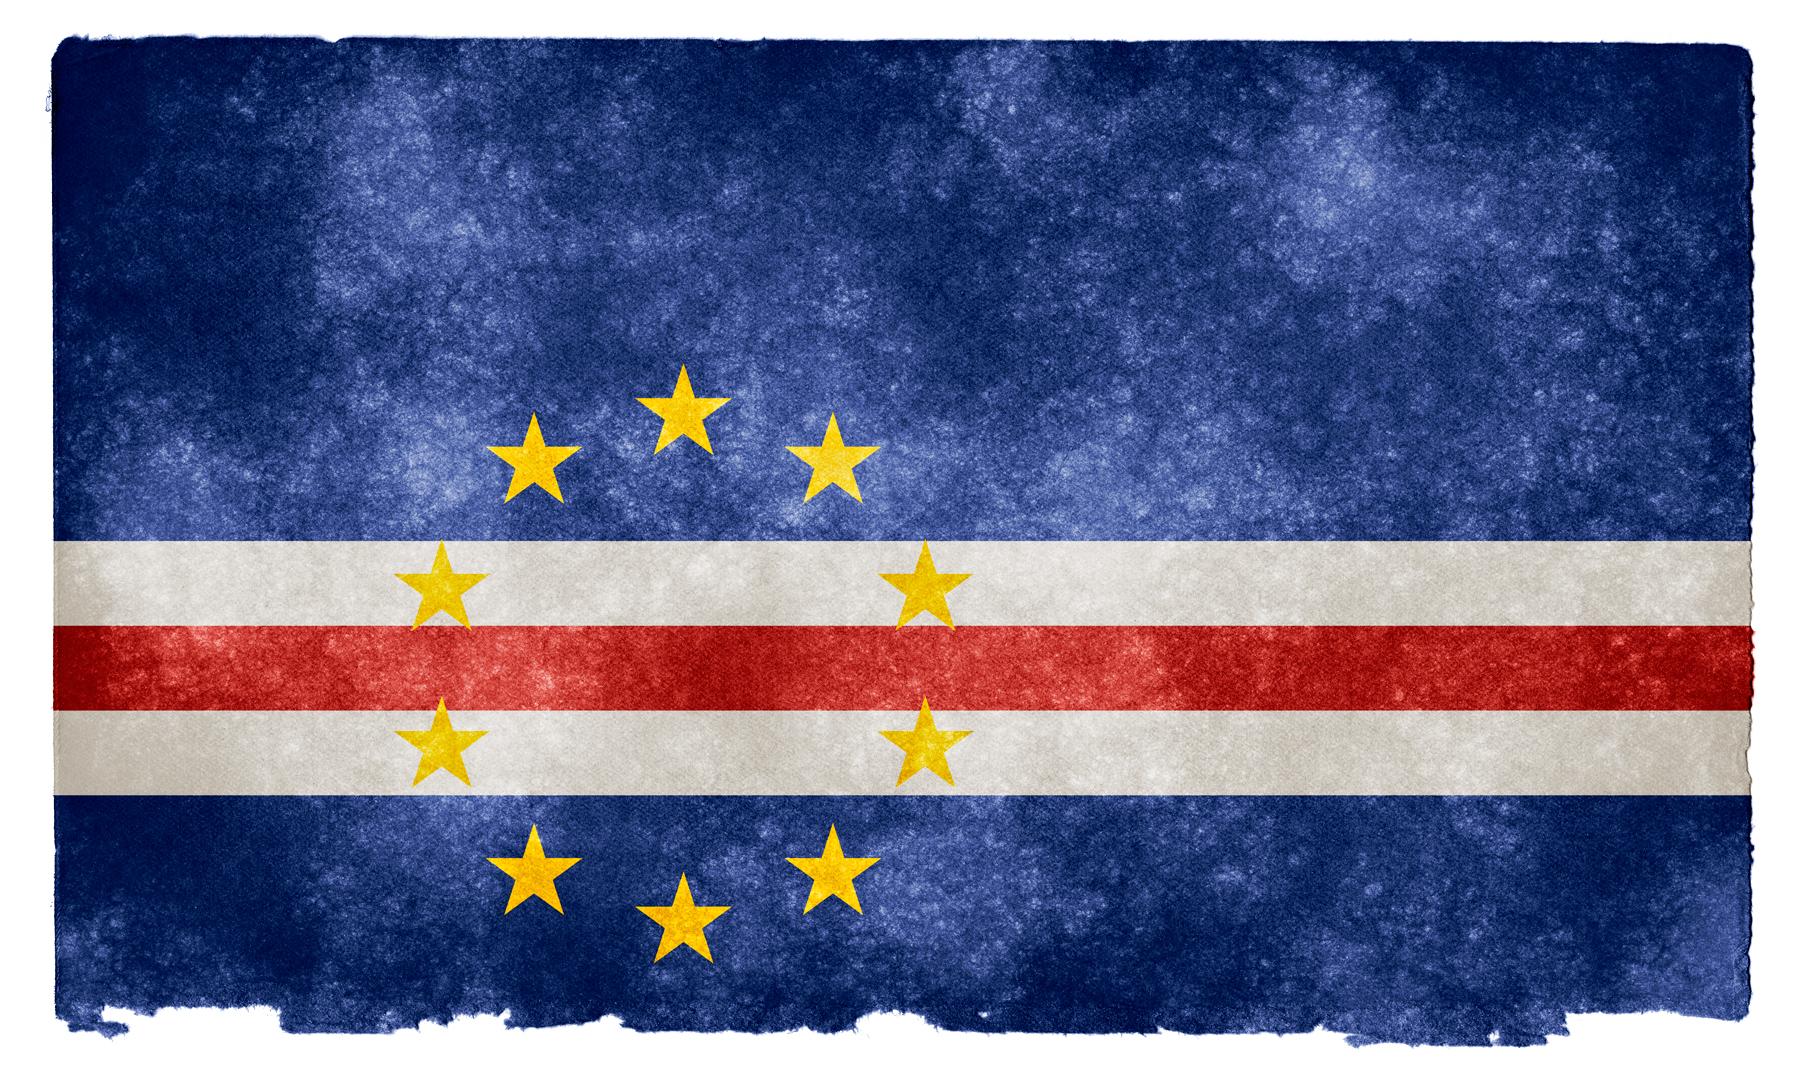 Cape verde grunge flag photo